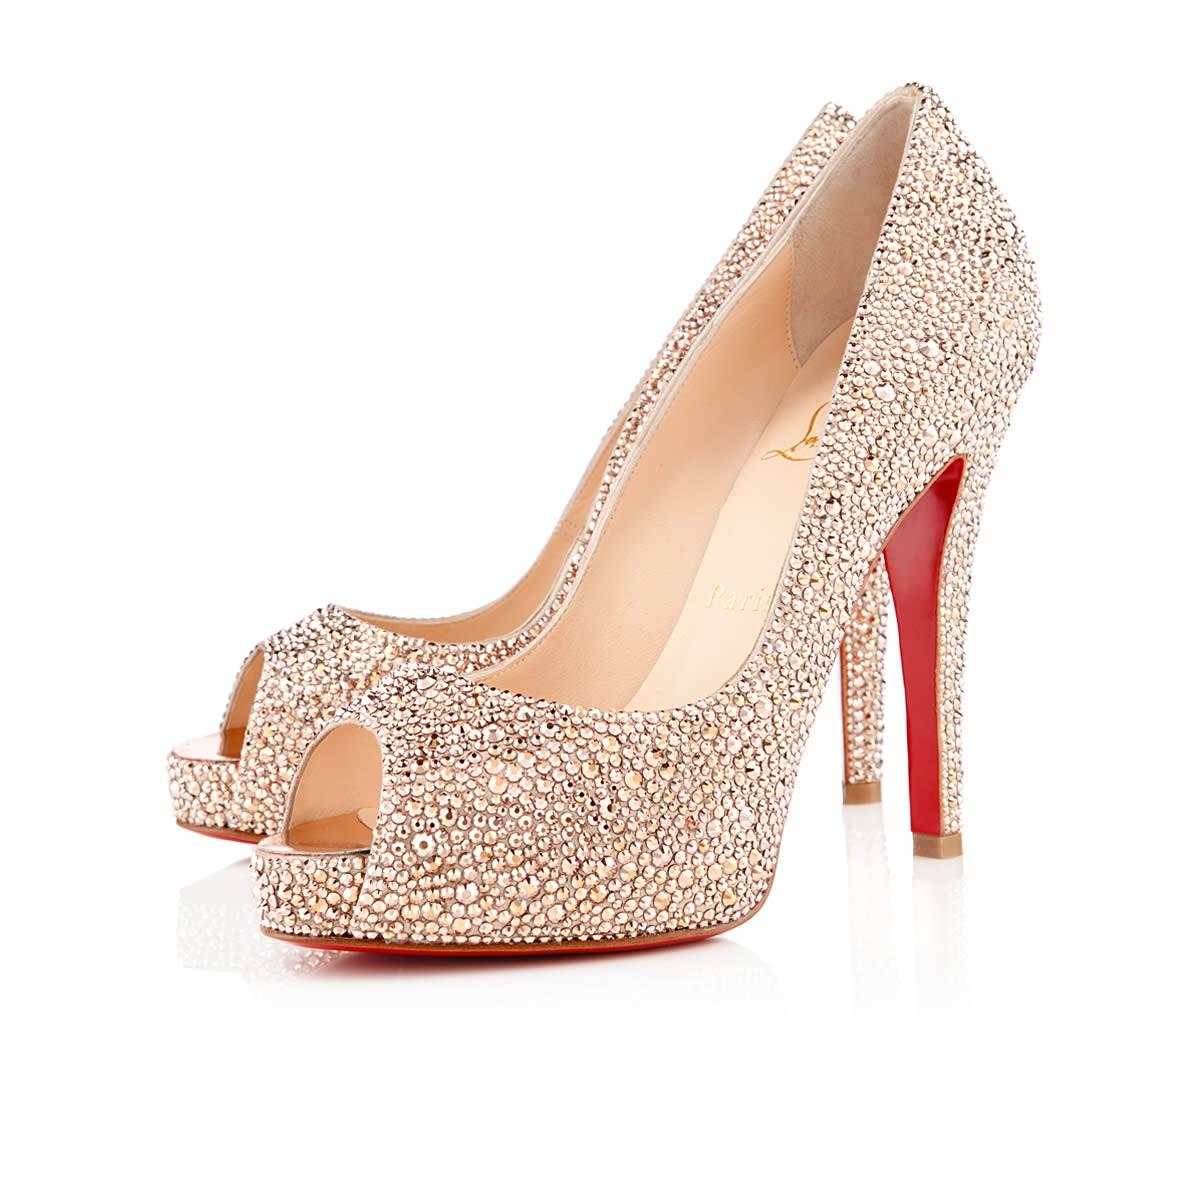 comfy bridal shoes photo - 1